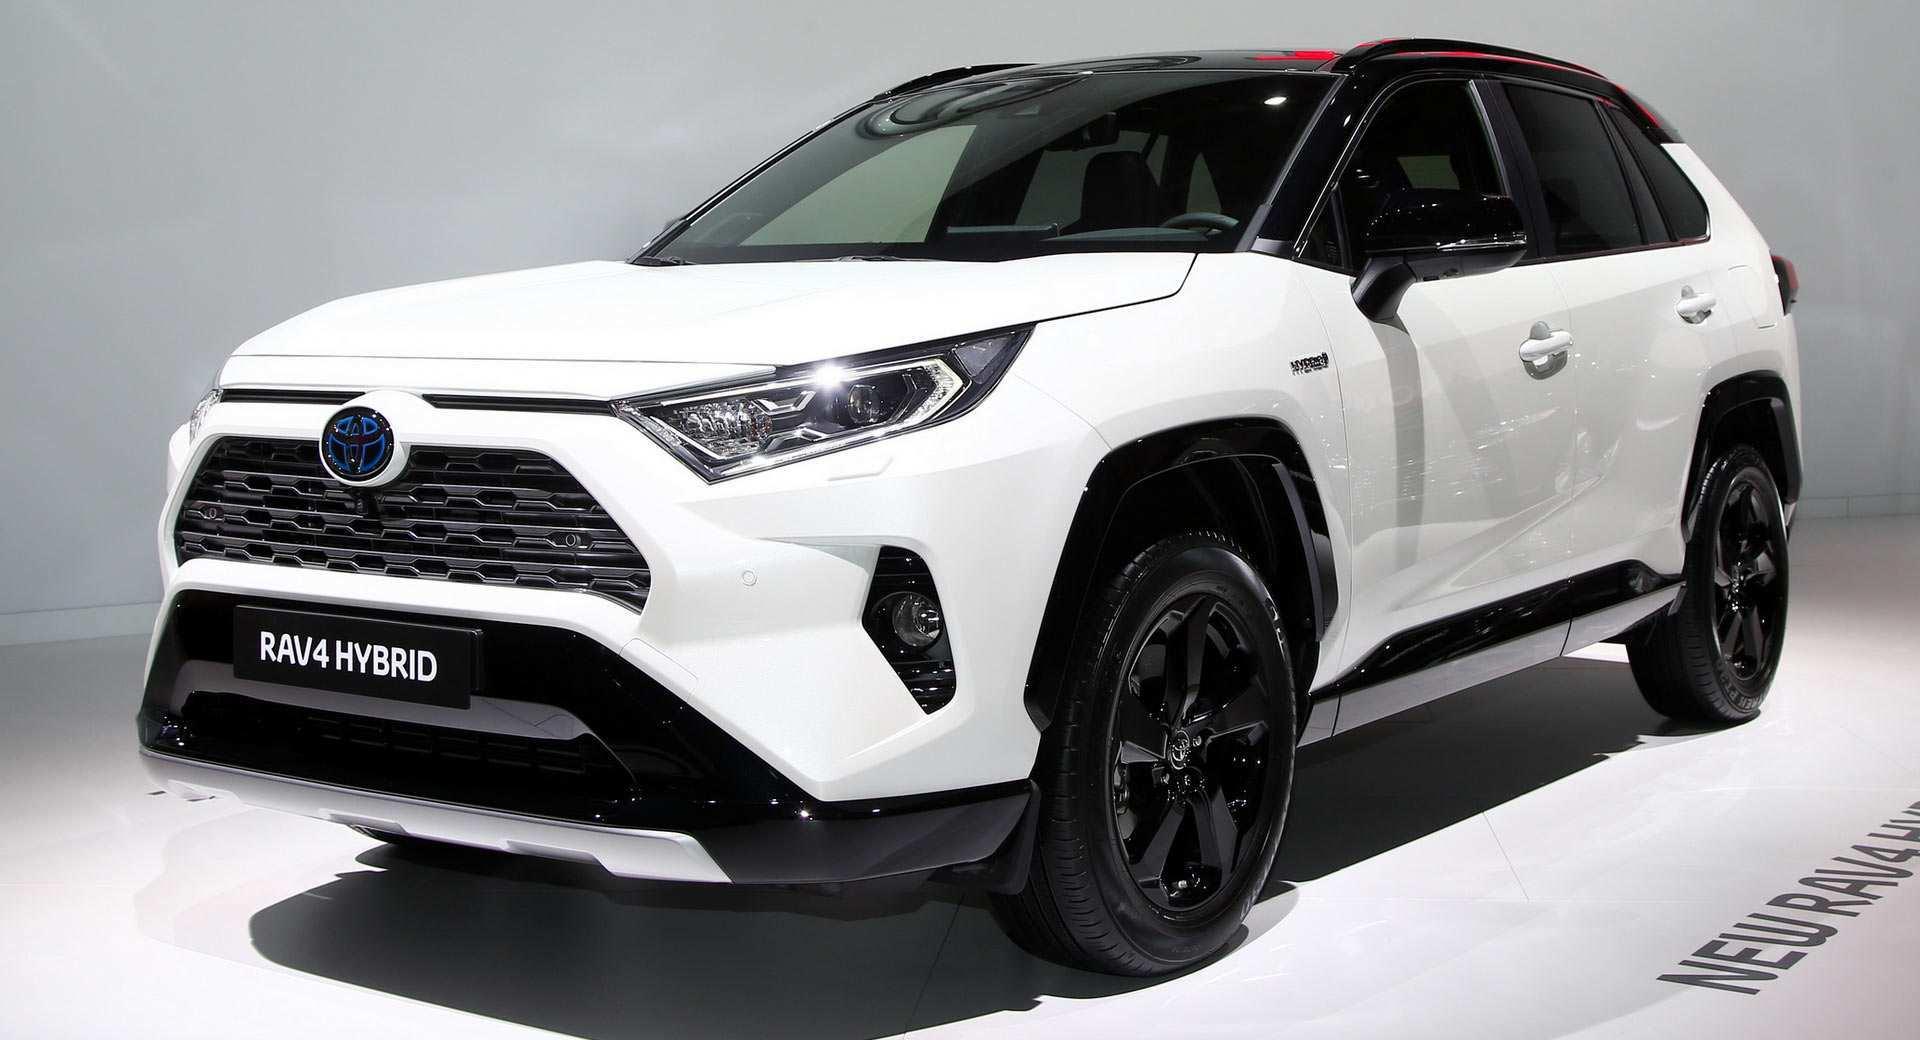 41 Gallery of New Plug In Hybrid Toyota 2019 Engine Price with New Plug In Hybrid Toyota 2019 Engine